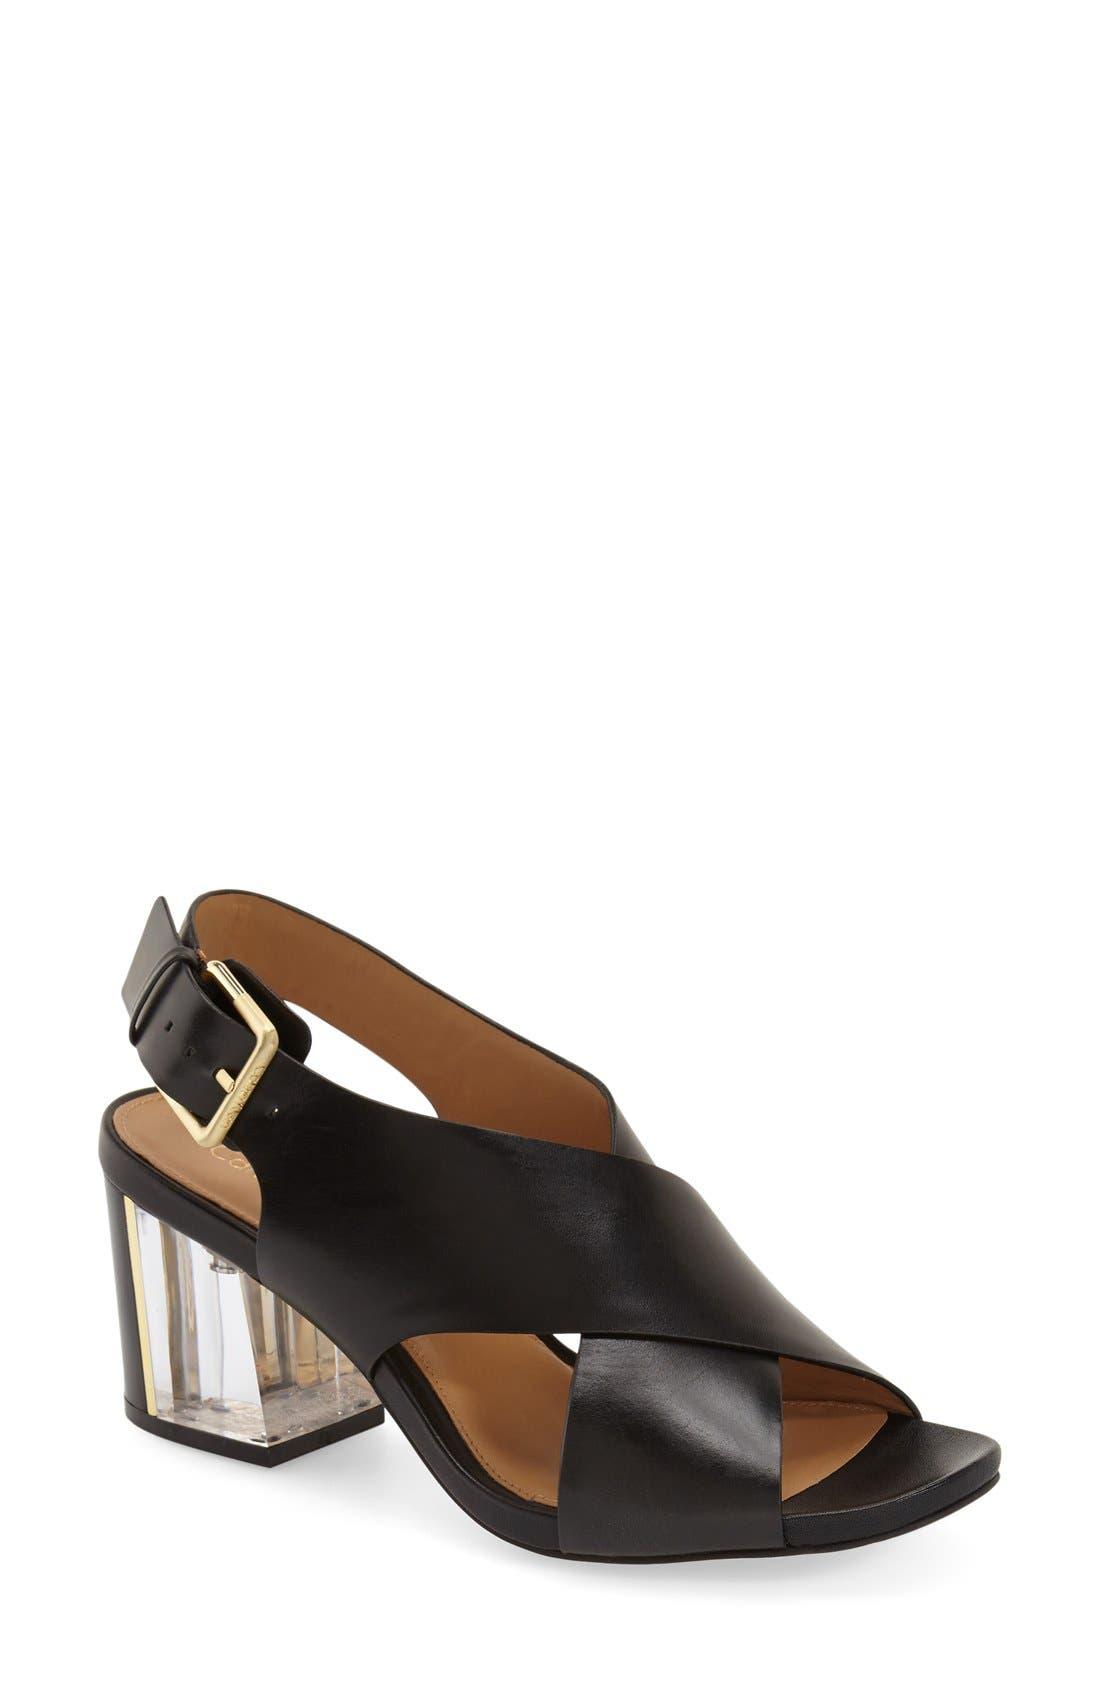 Alternate Image 1 Selected - Calvin Klein 'Loni' Clear Block Heel Sandal (Women)